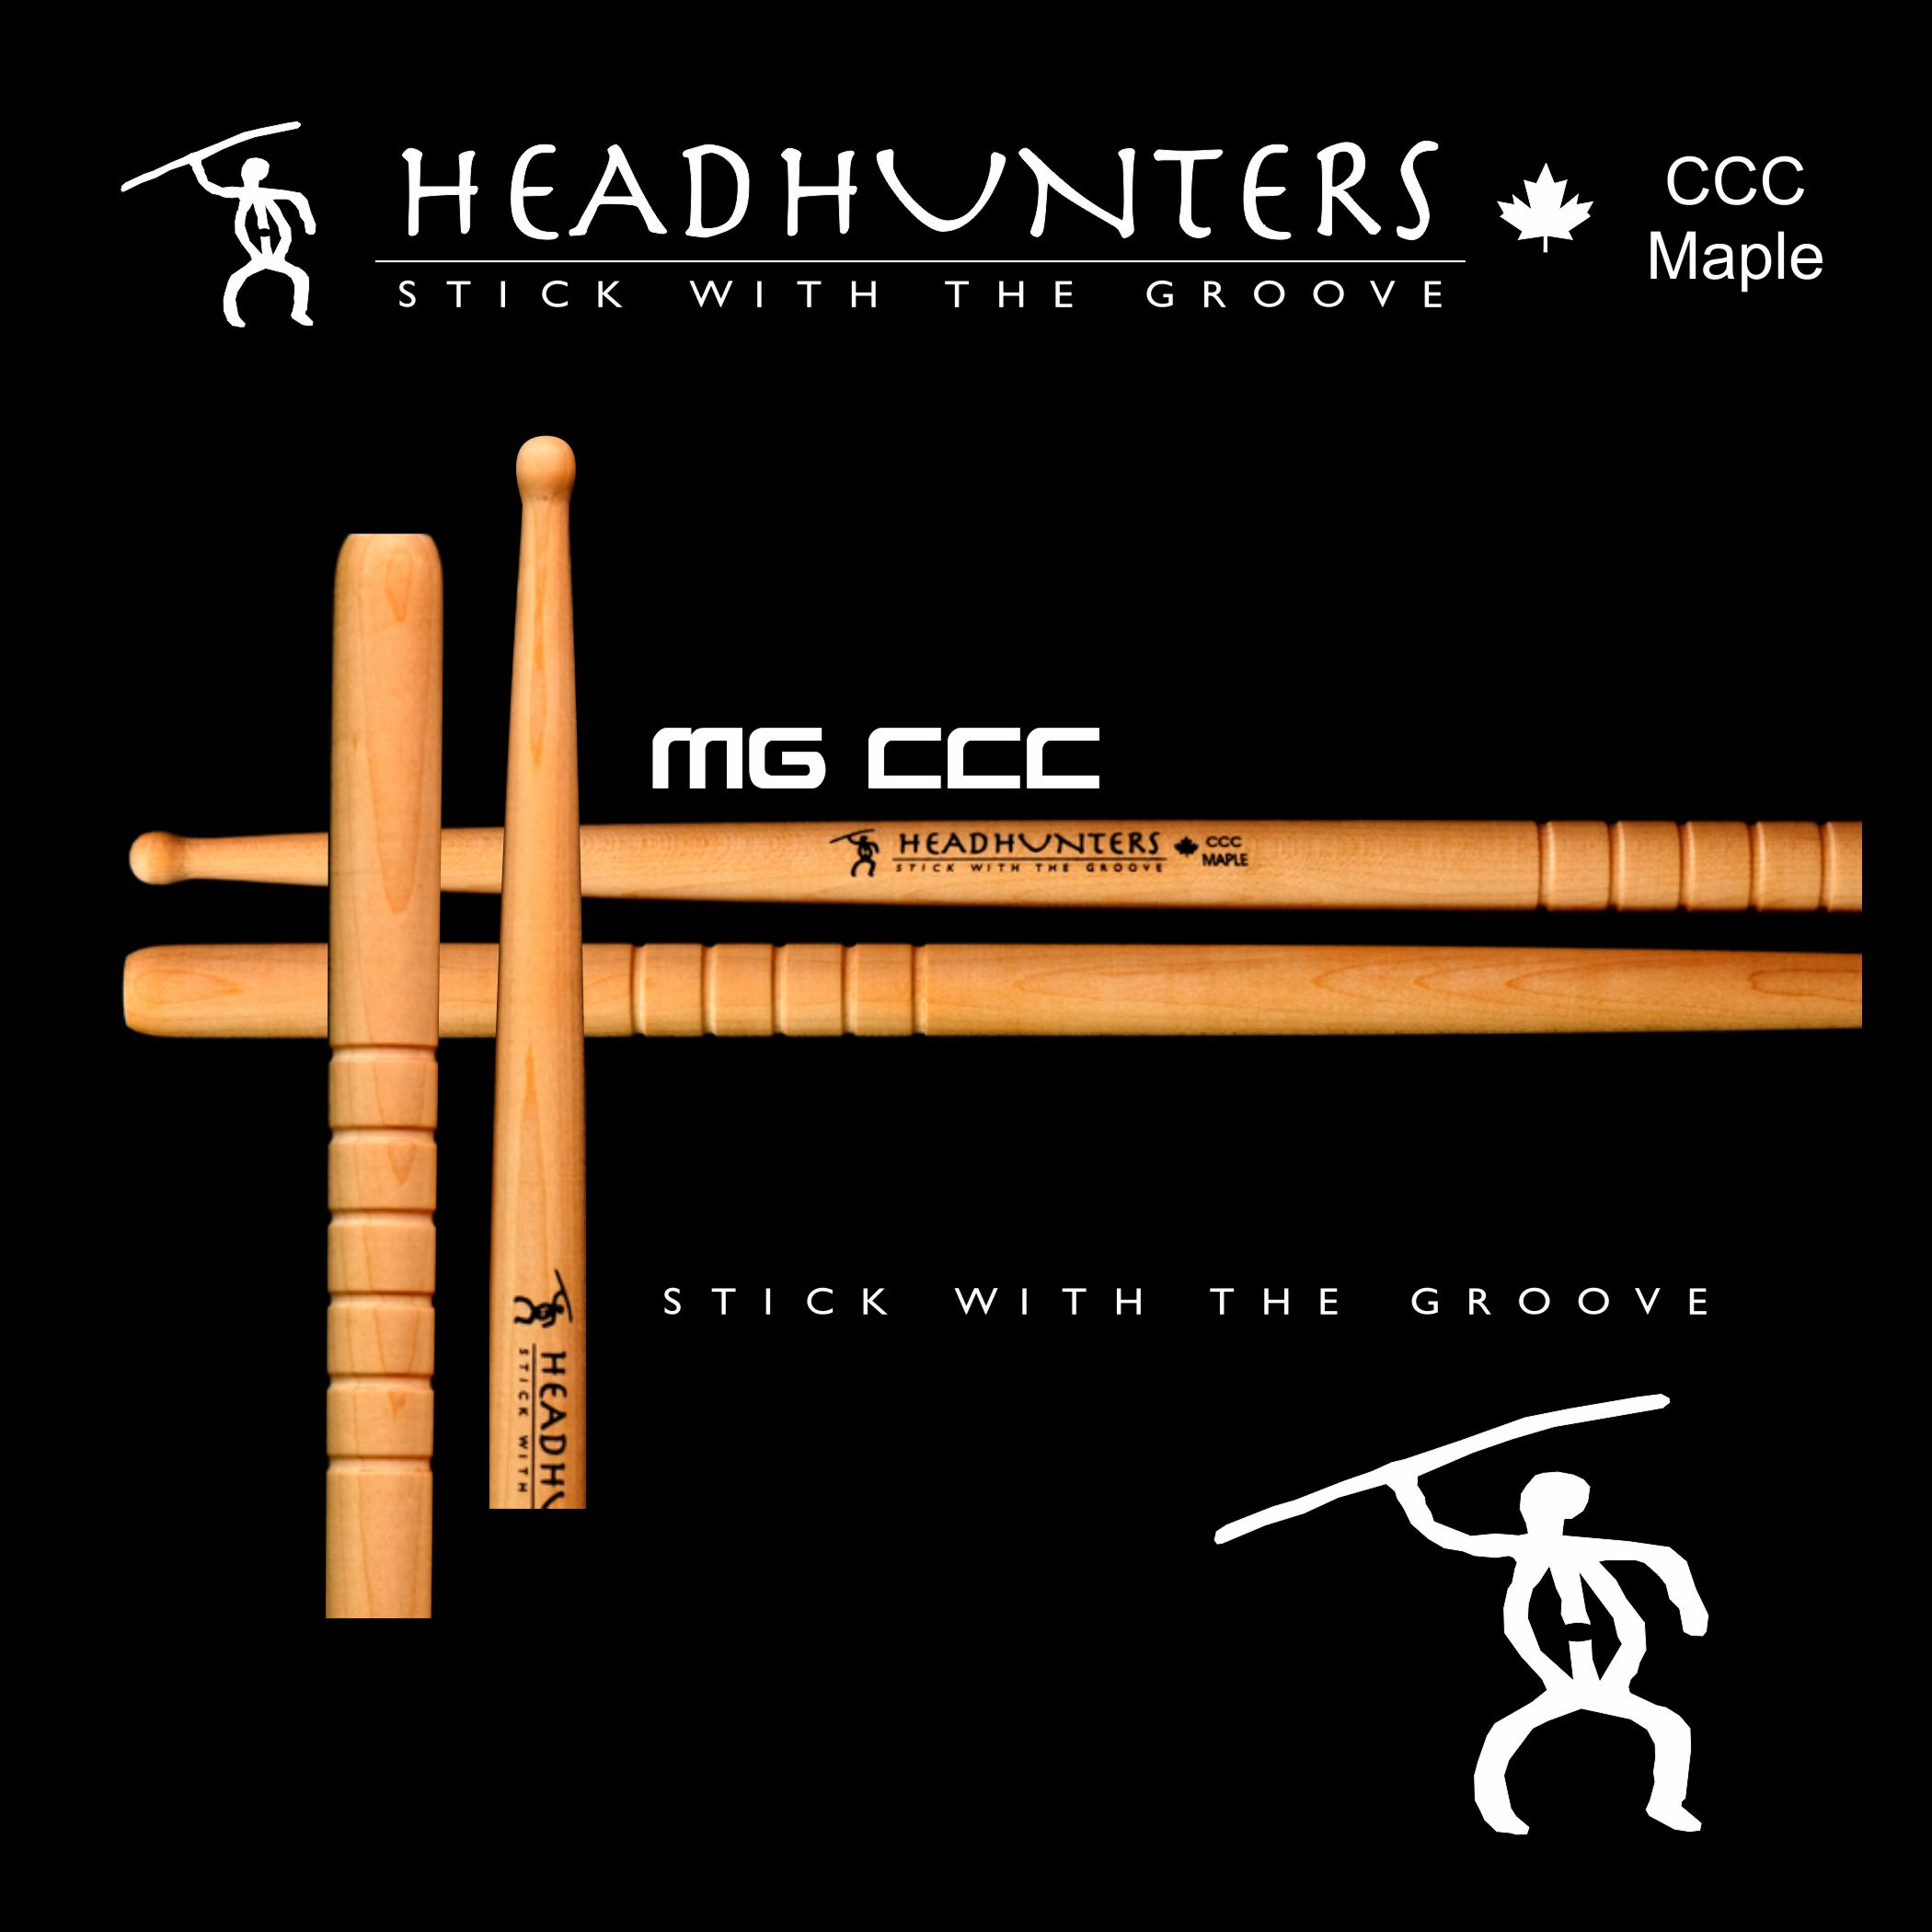 MG CCC